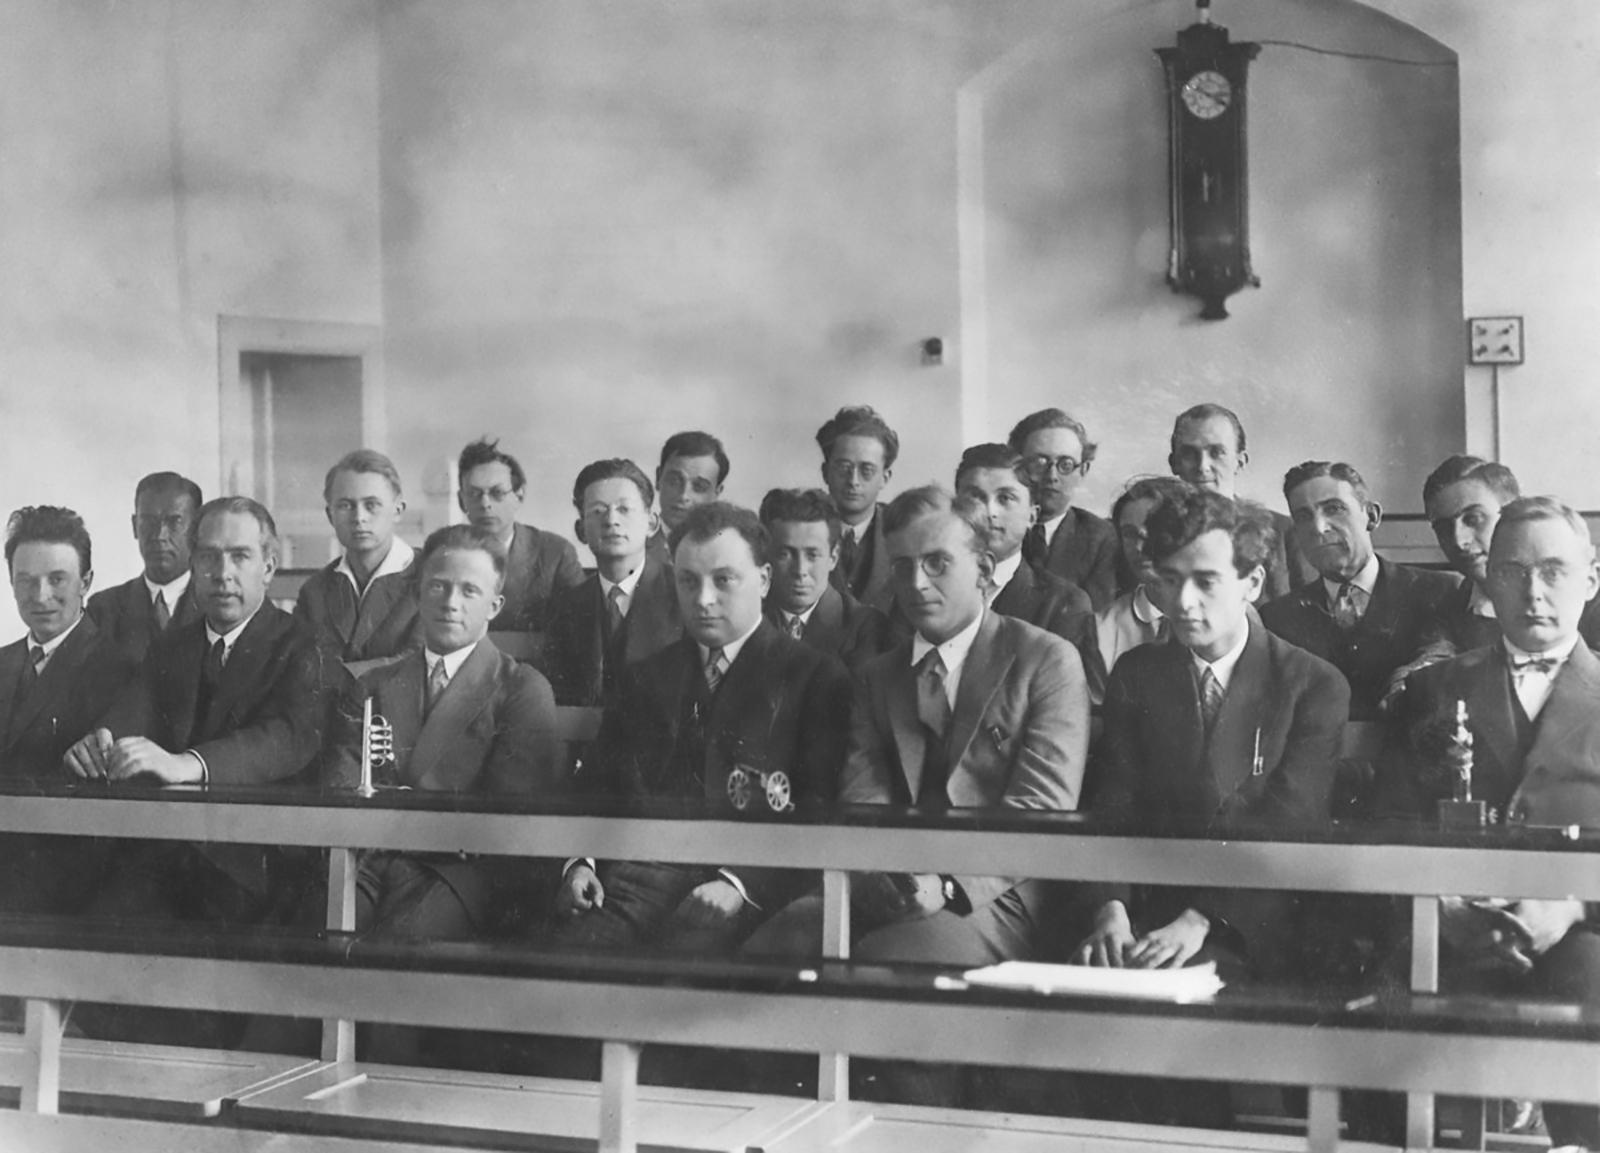 Conferenza di Copenaghen 1930. In prima fila da sinistra verso destra: Christian Klein, Niels Bohr, Werner Heisenberg, Wolfgang Pauli, George Gamow, Lev Landau, Hans Kramers.